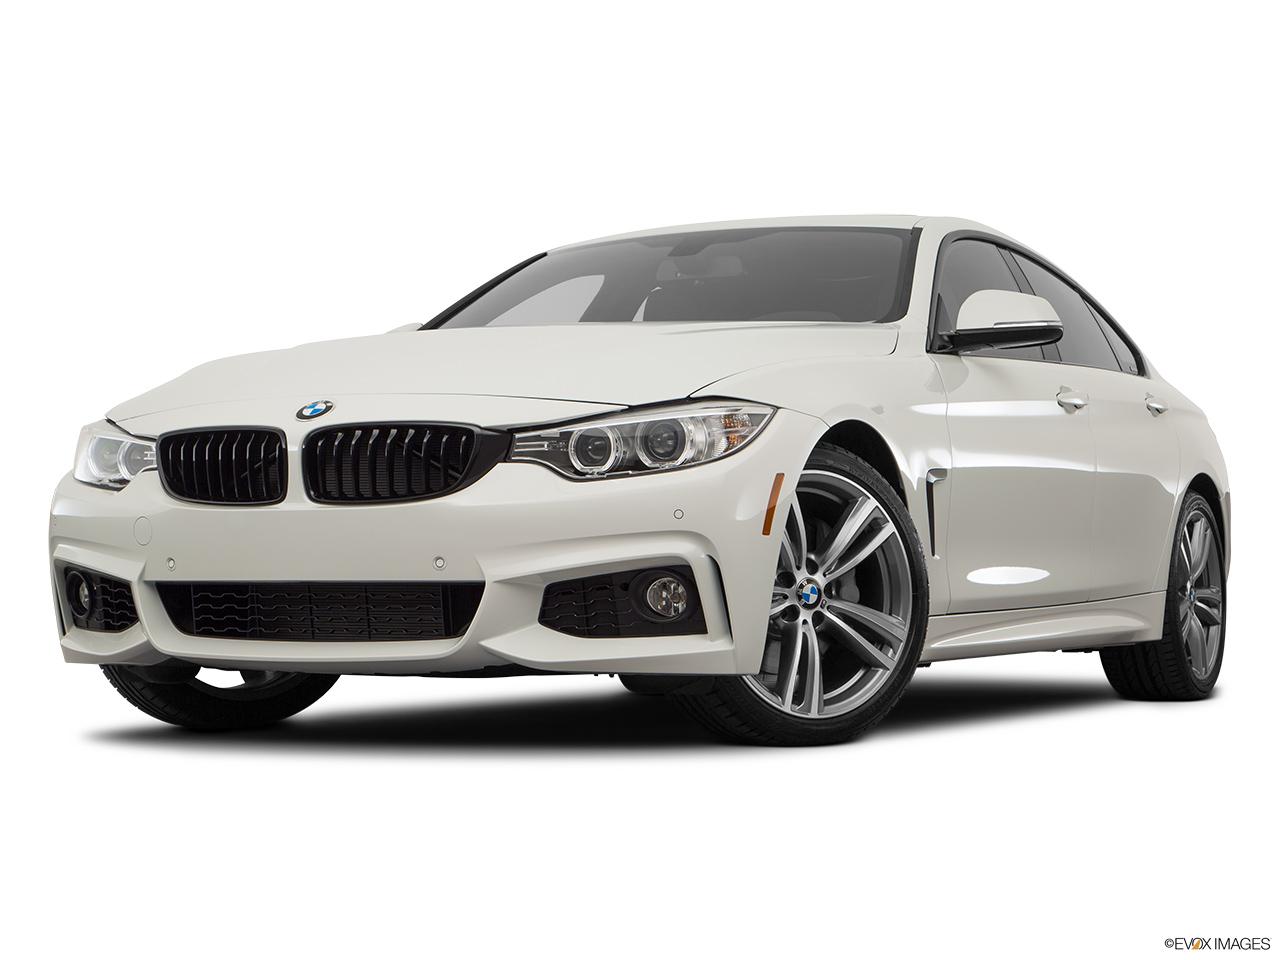 car pictures list for bmw 4 series gran coupe 2018 435i. Black Bedroom Furniture Sets. Home Design Ideas